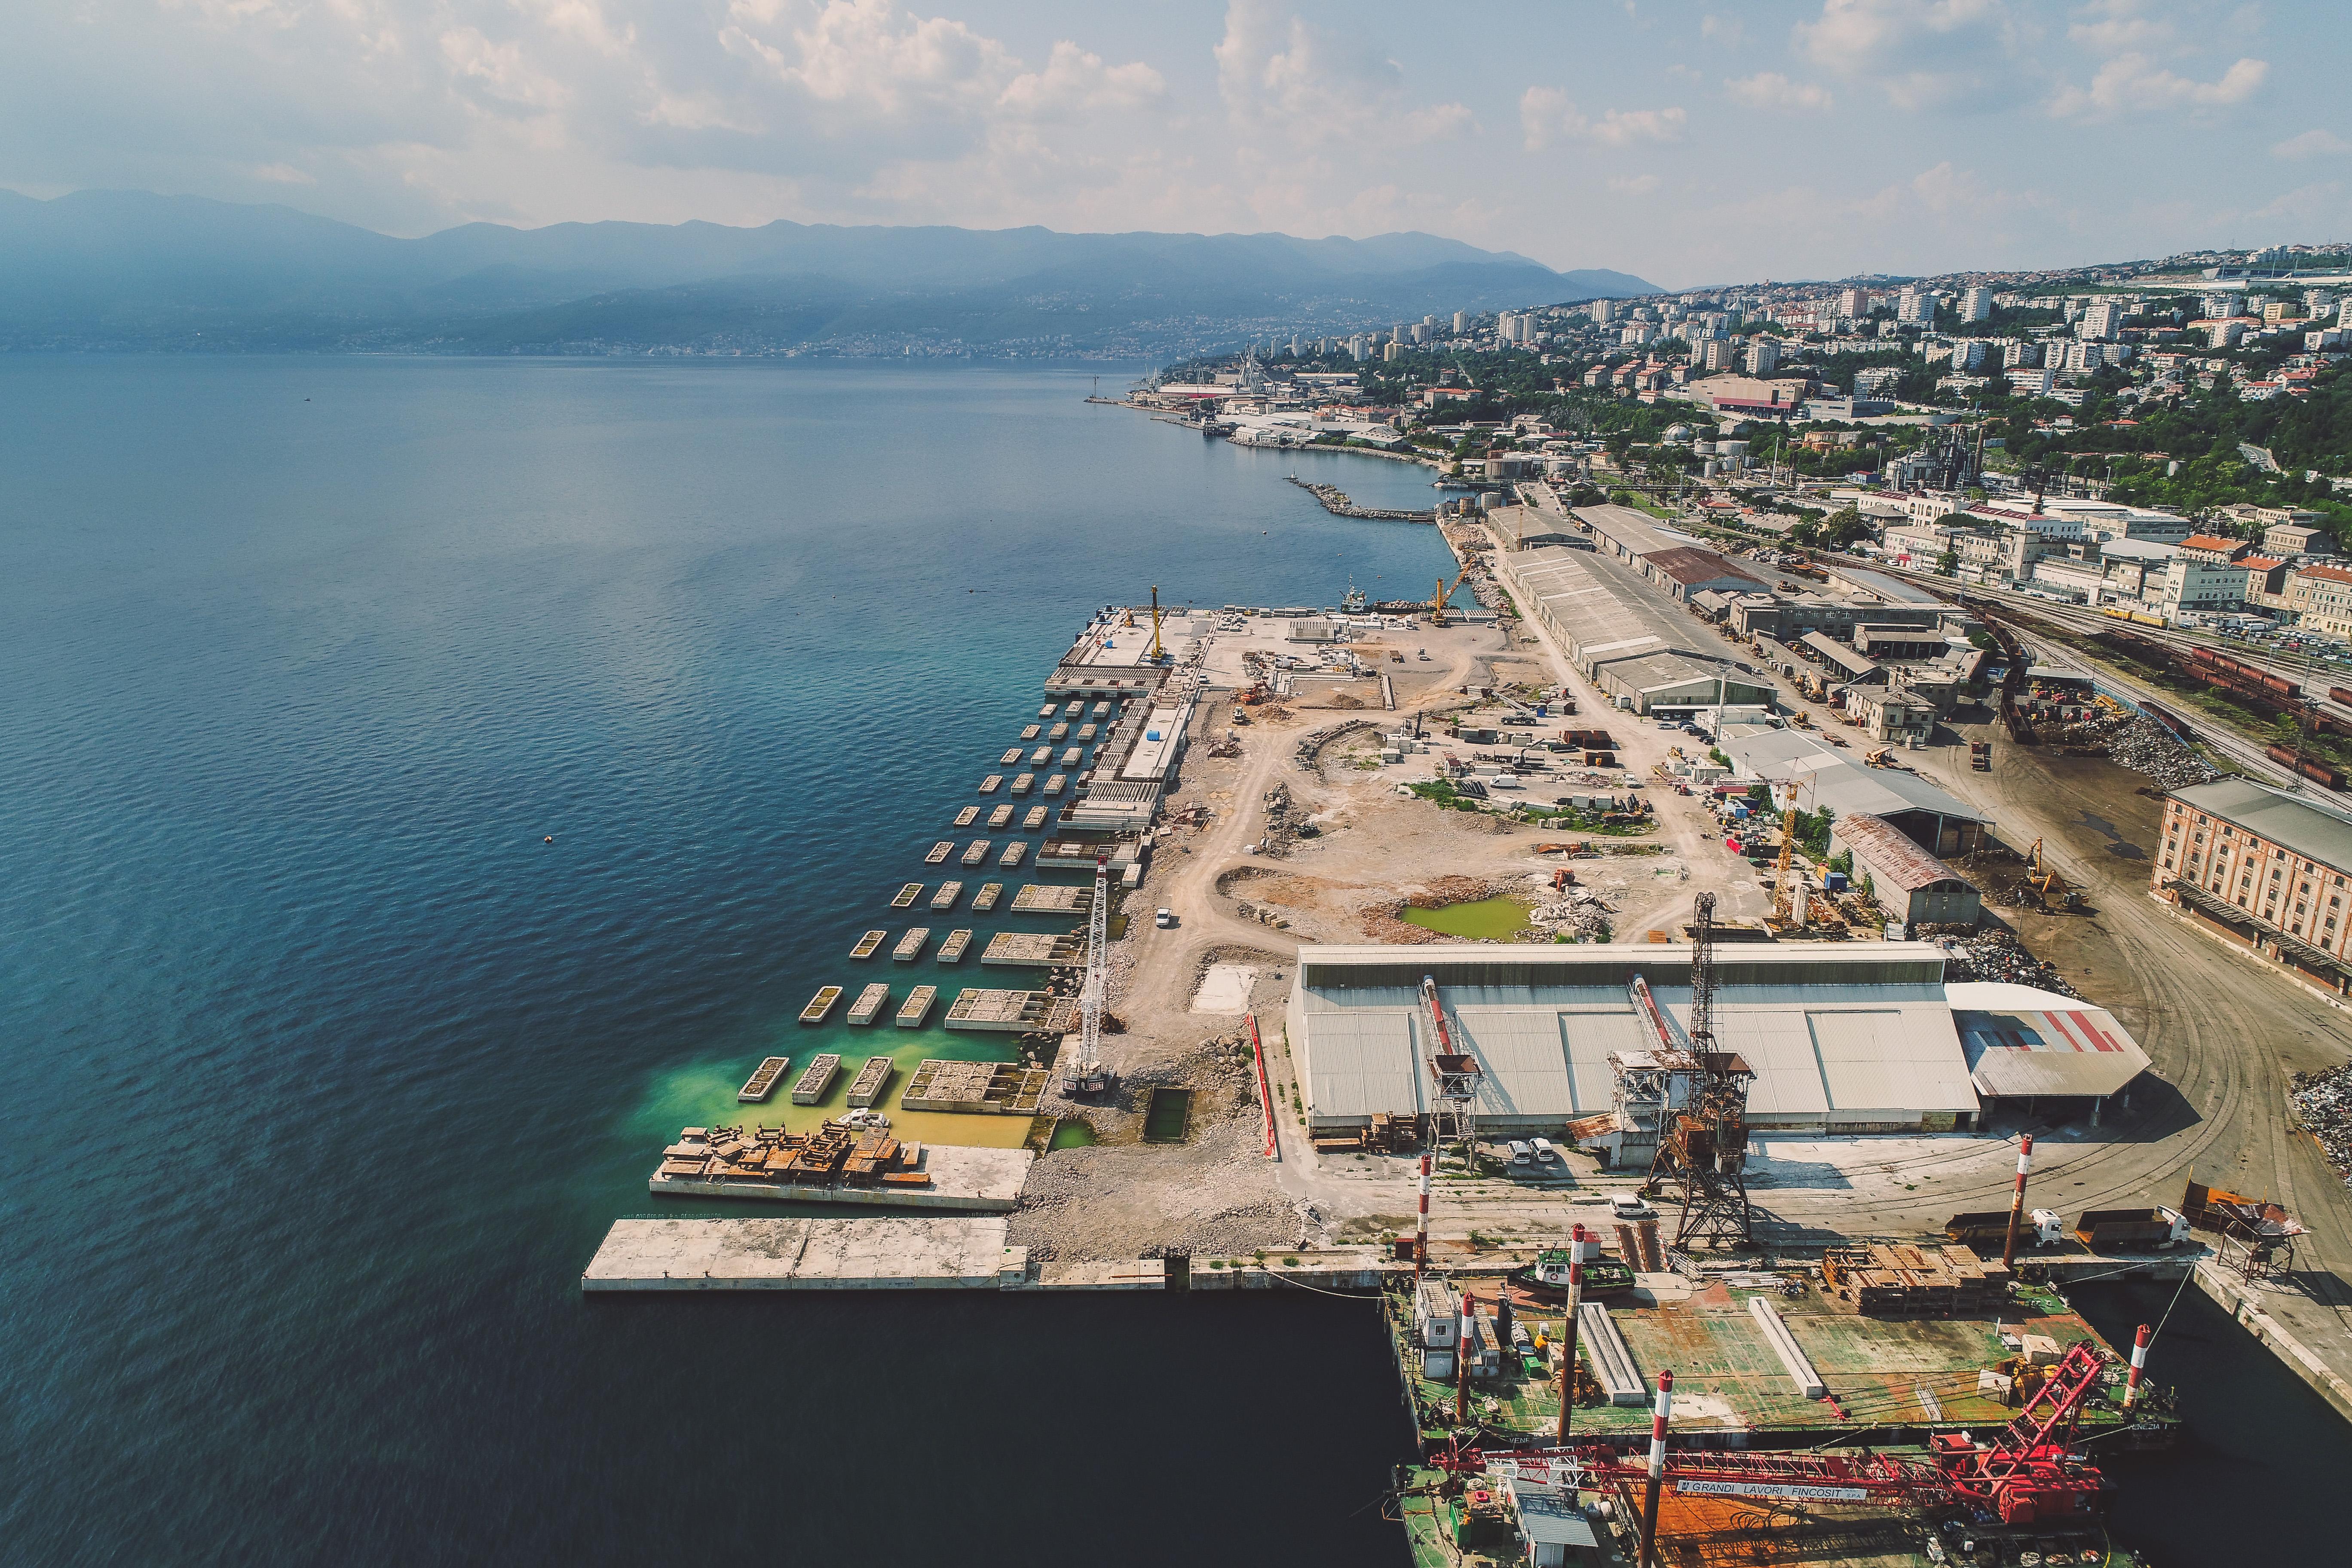 Gradnja novog kontejnerskog terminala na Zagrebačkoj obali